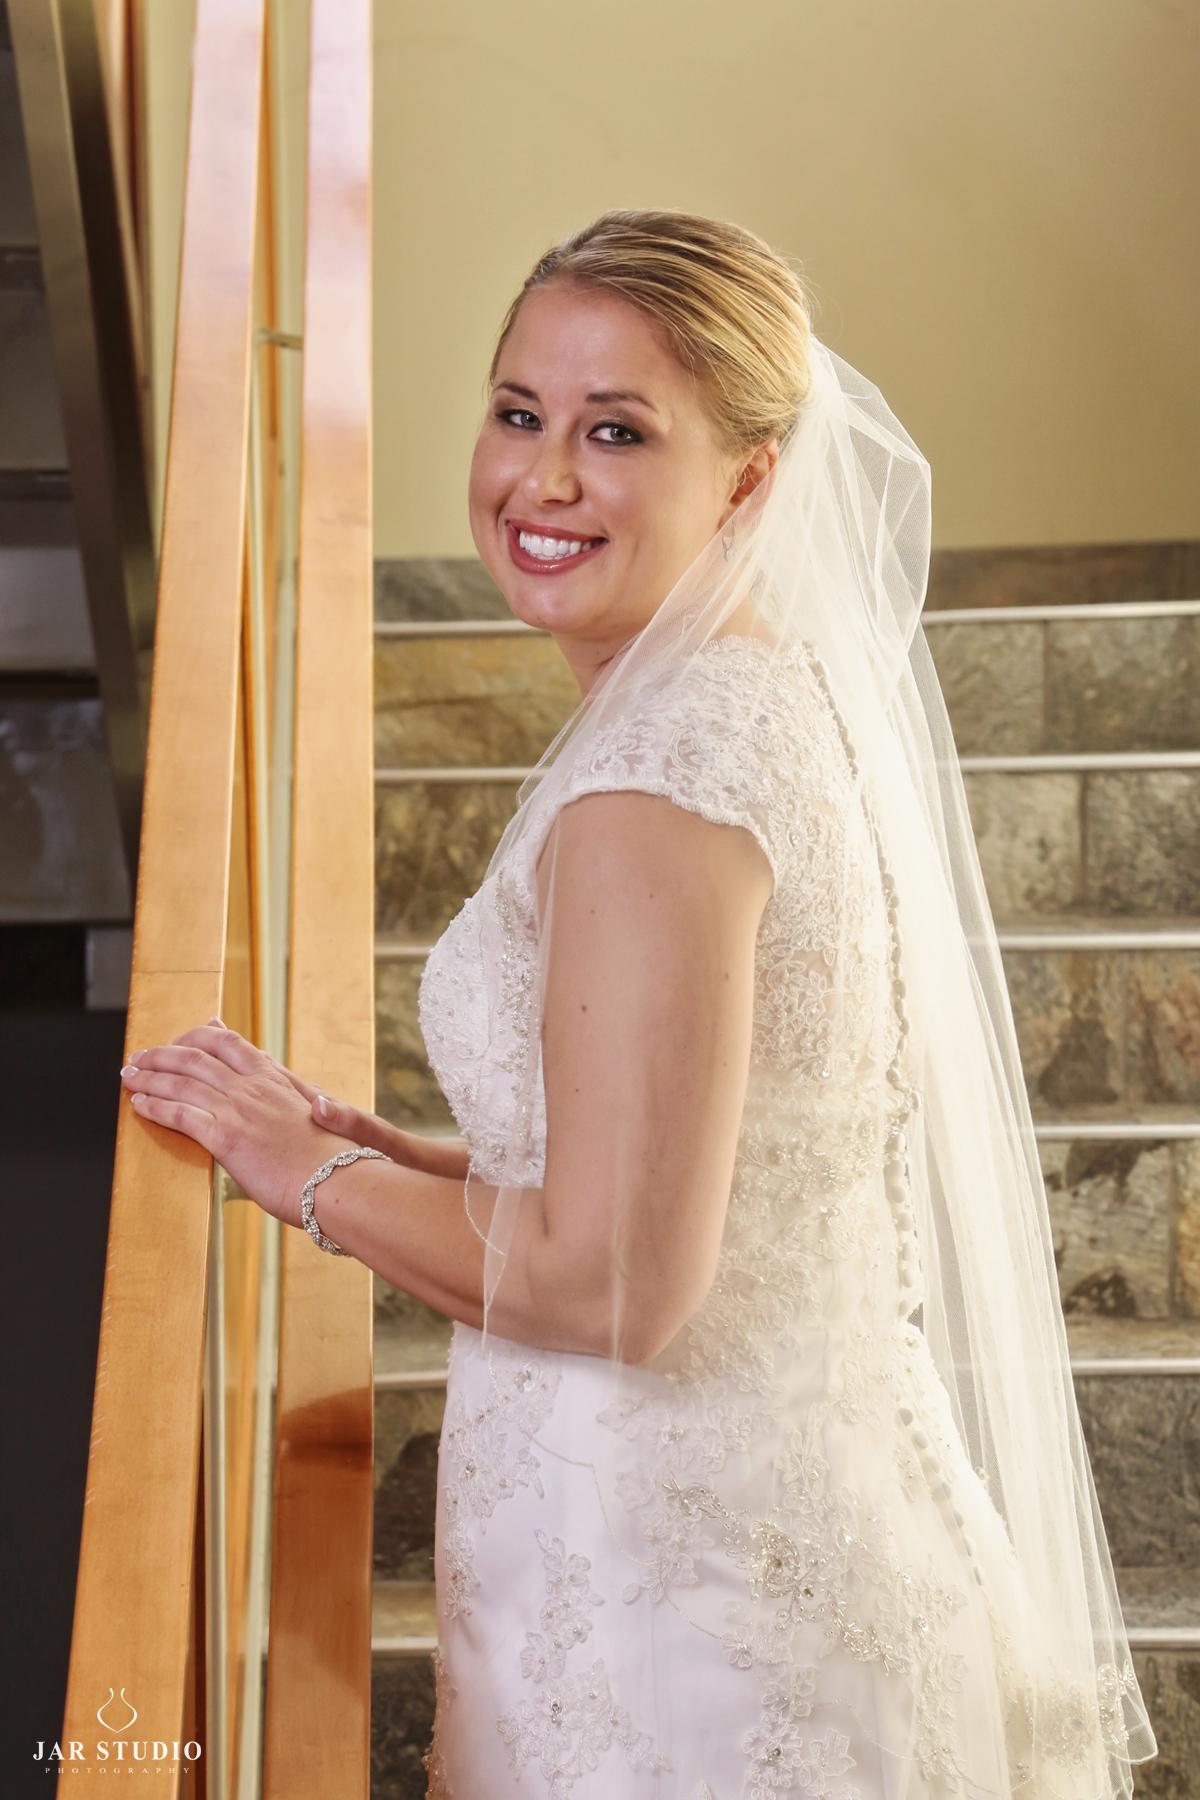 07-beautiful-bride-conservative-dress-jarstudio.jpg